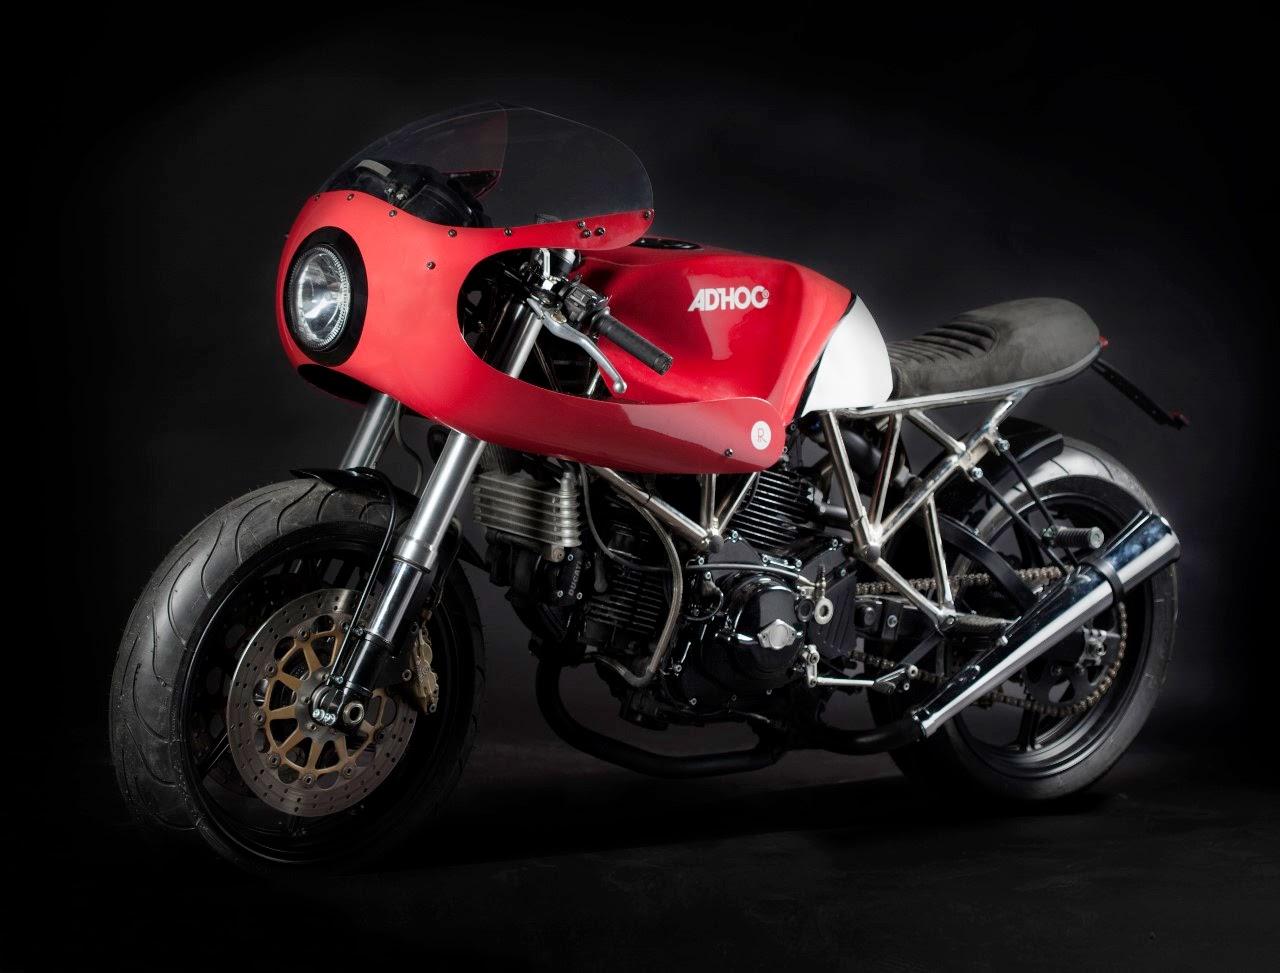 Ducati 750 Ss 1998 Adroca Rocketgarage Cafe Racer